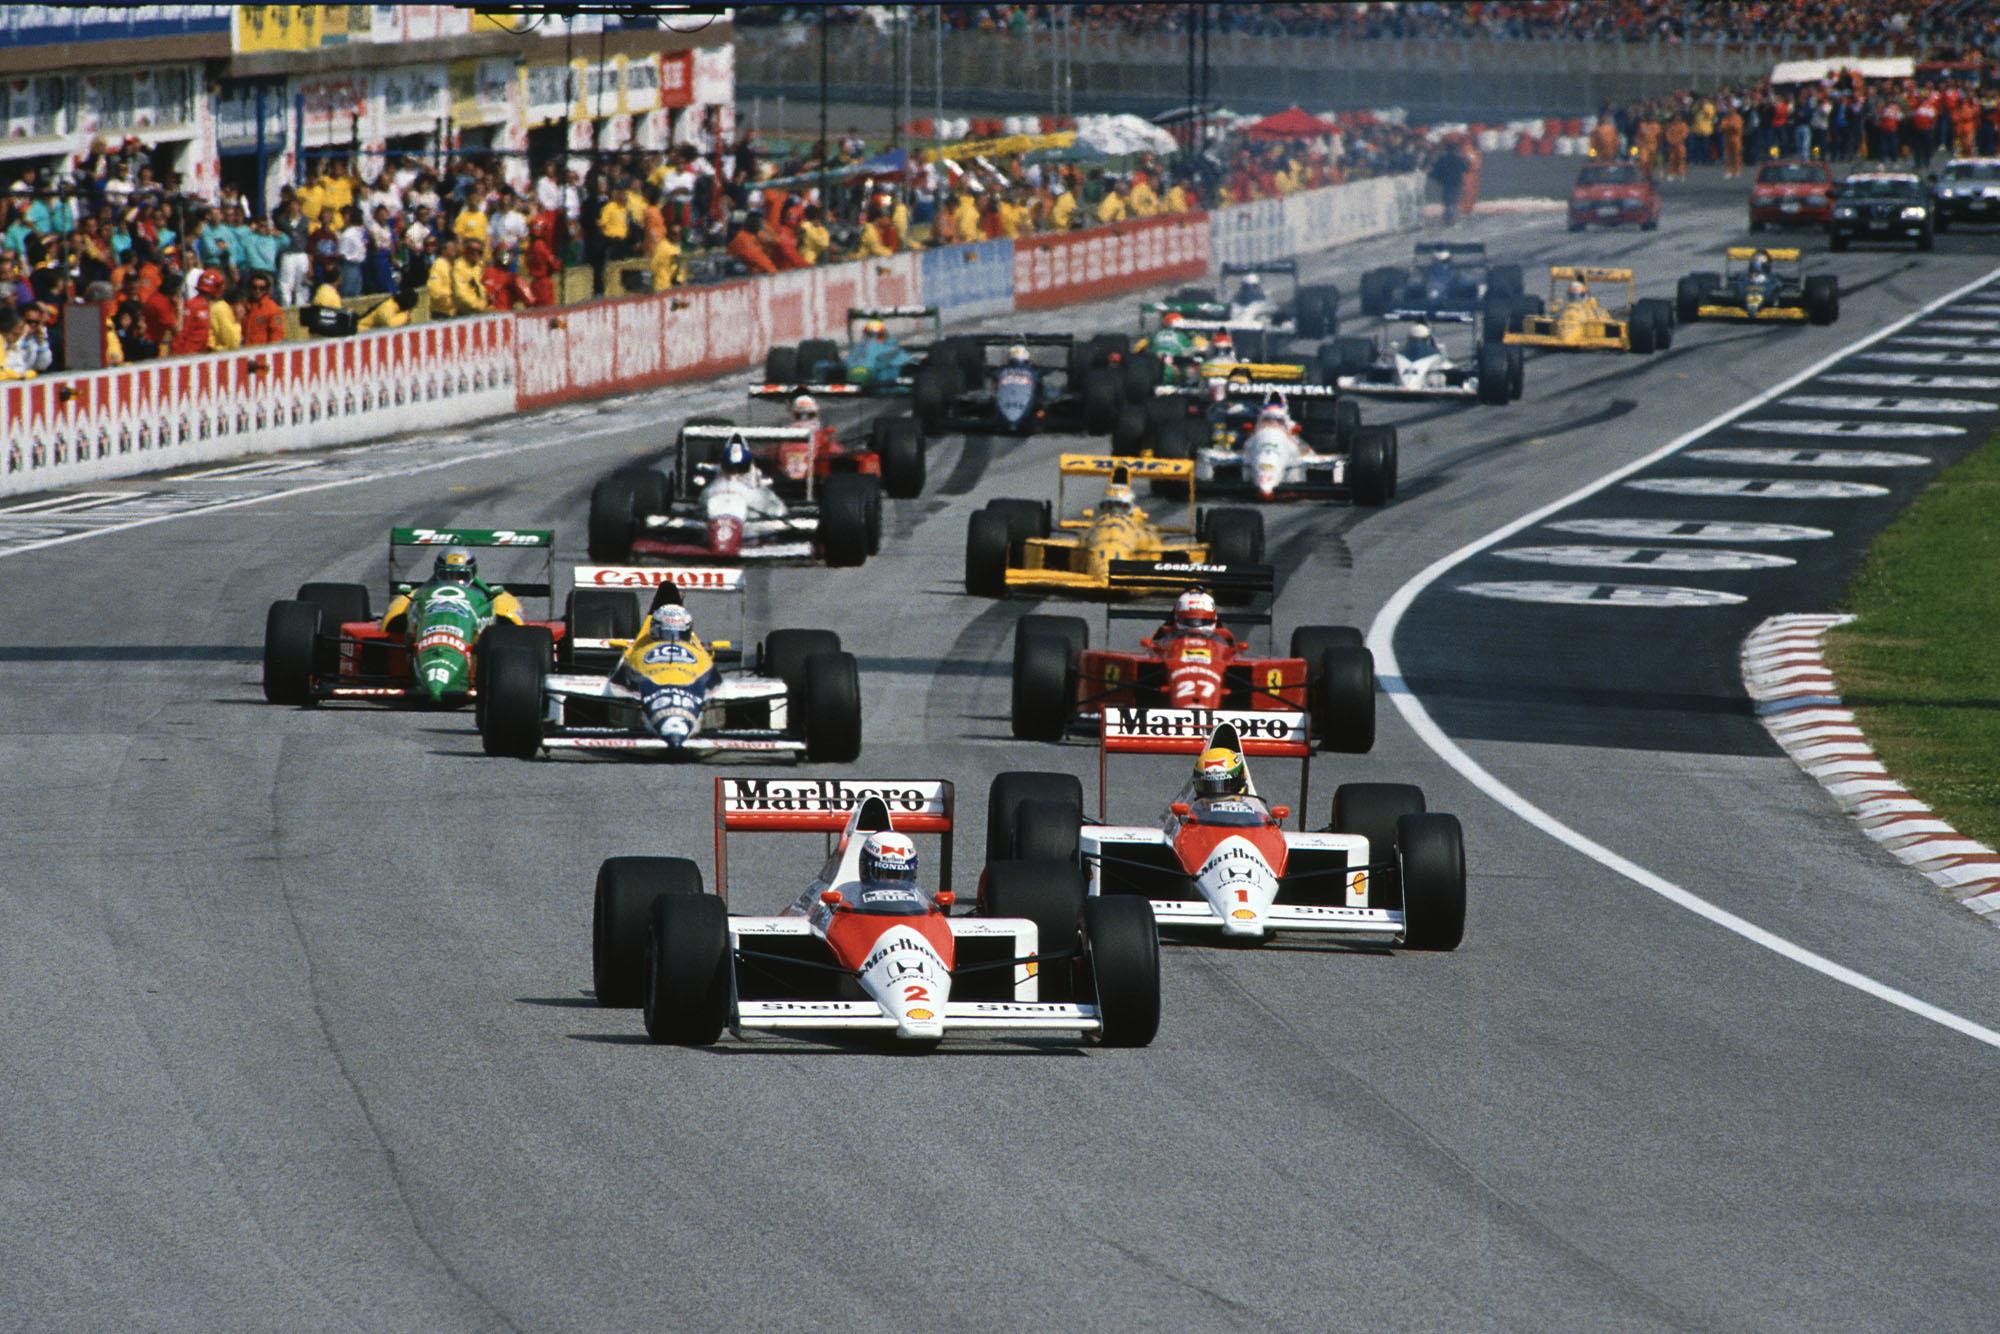 1989 SM GP start